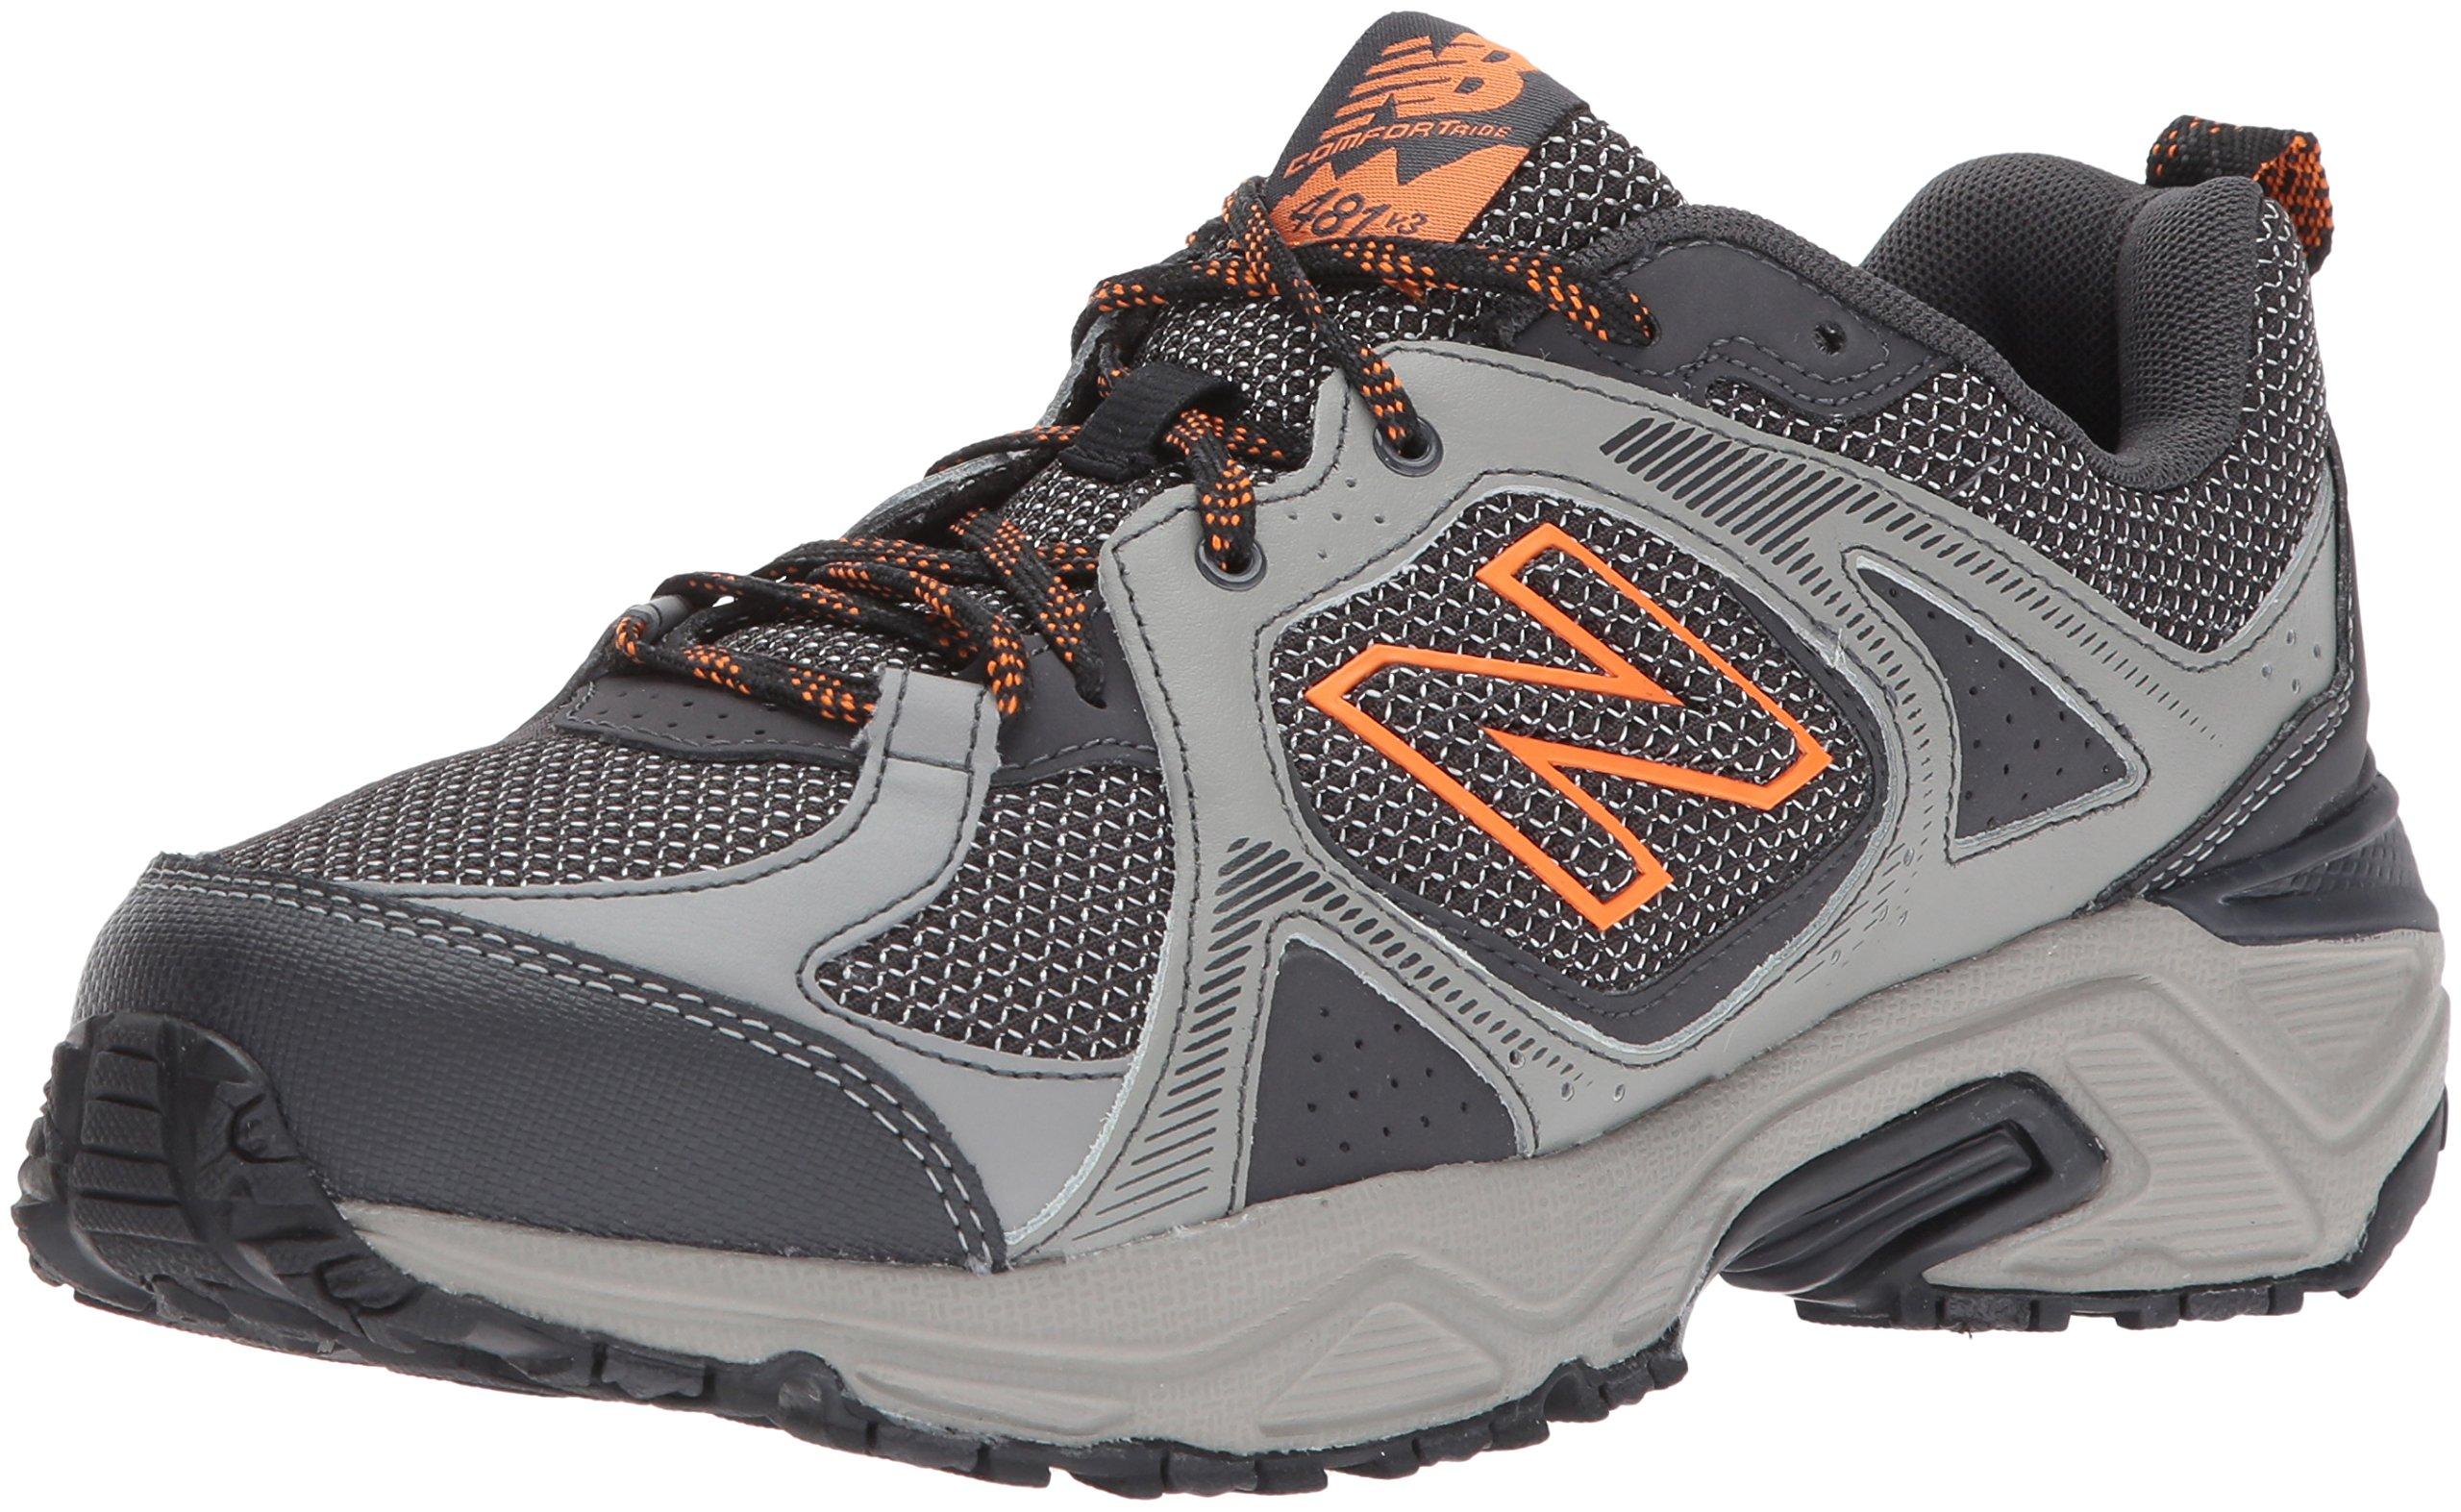 New Balance Men's 481V3 Cushioning Trail Running Shoe, Grey, 10.5 4E US by New Balance